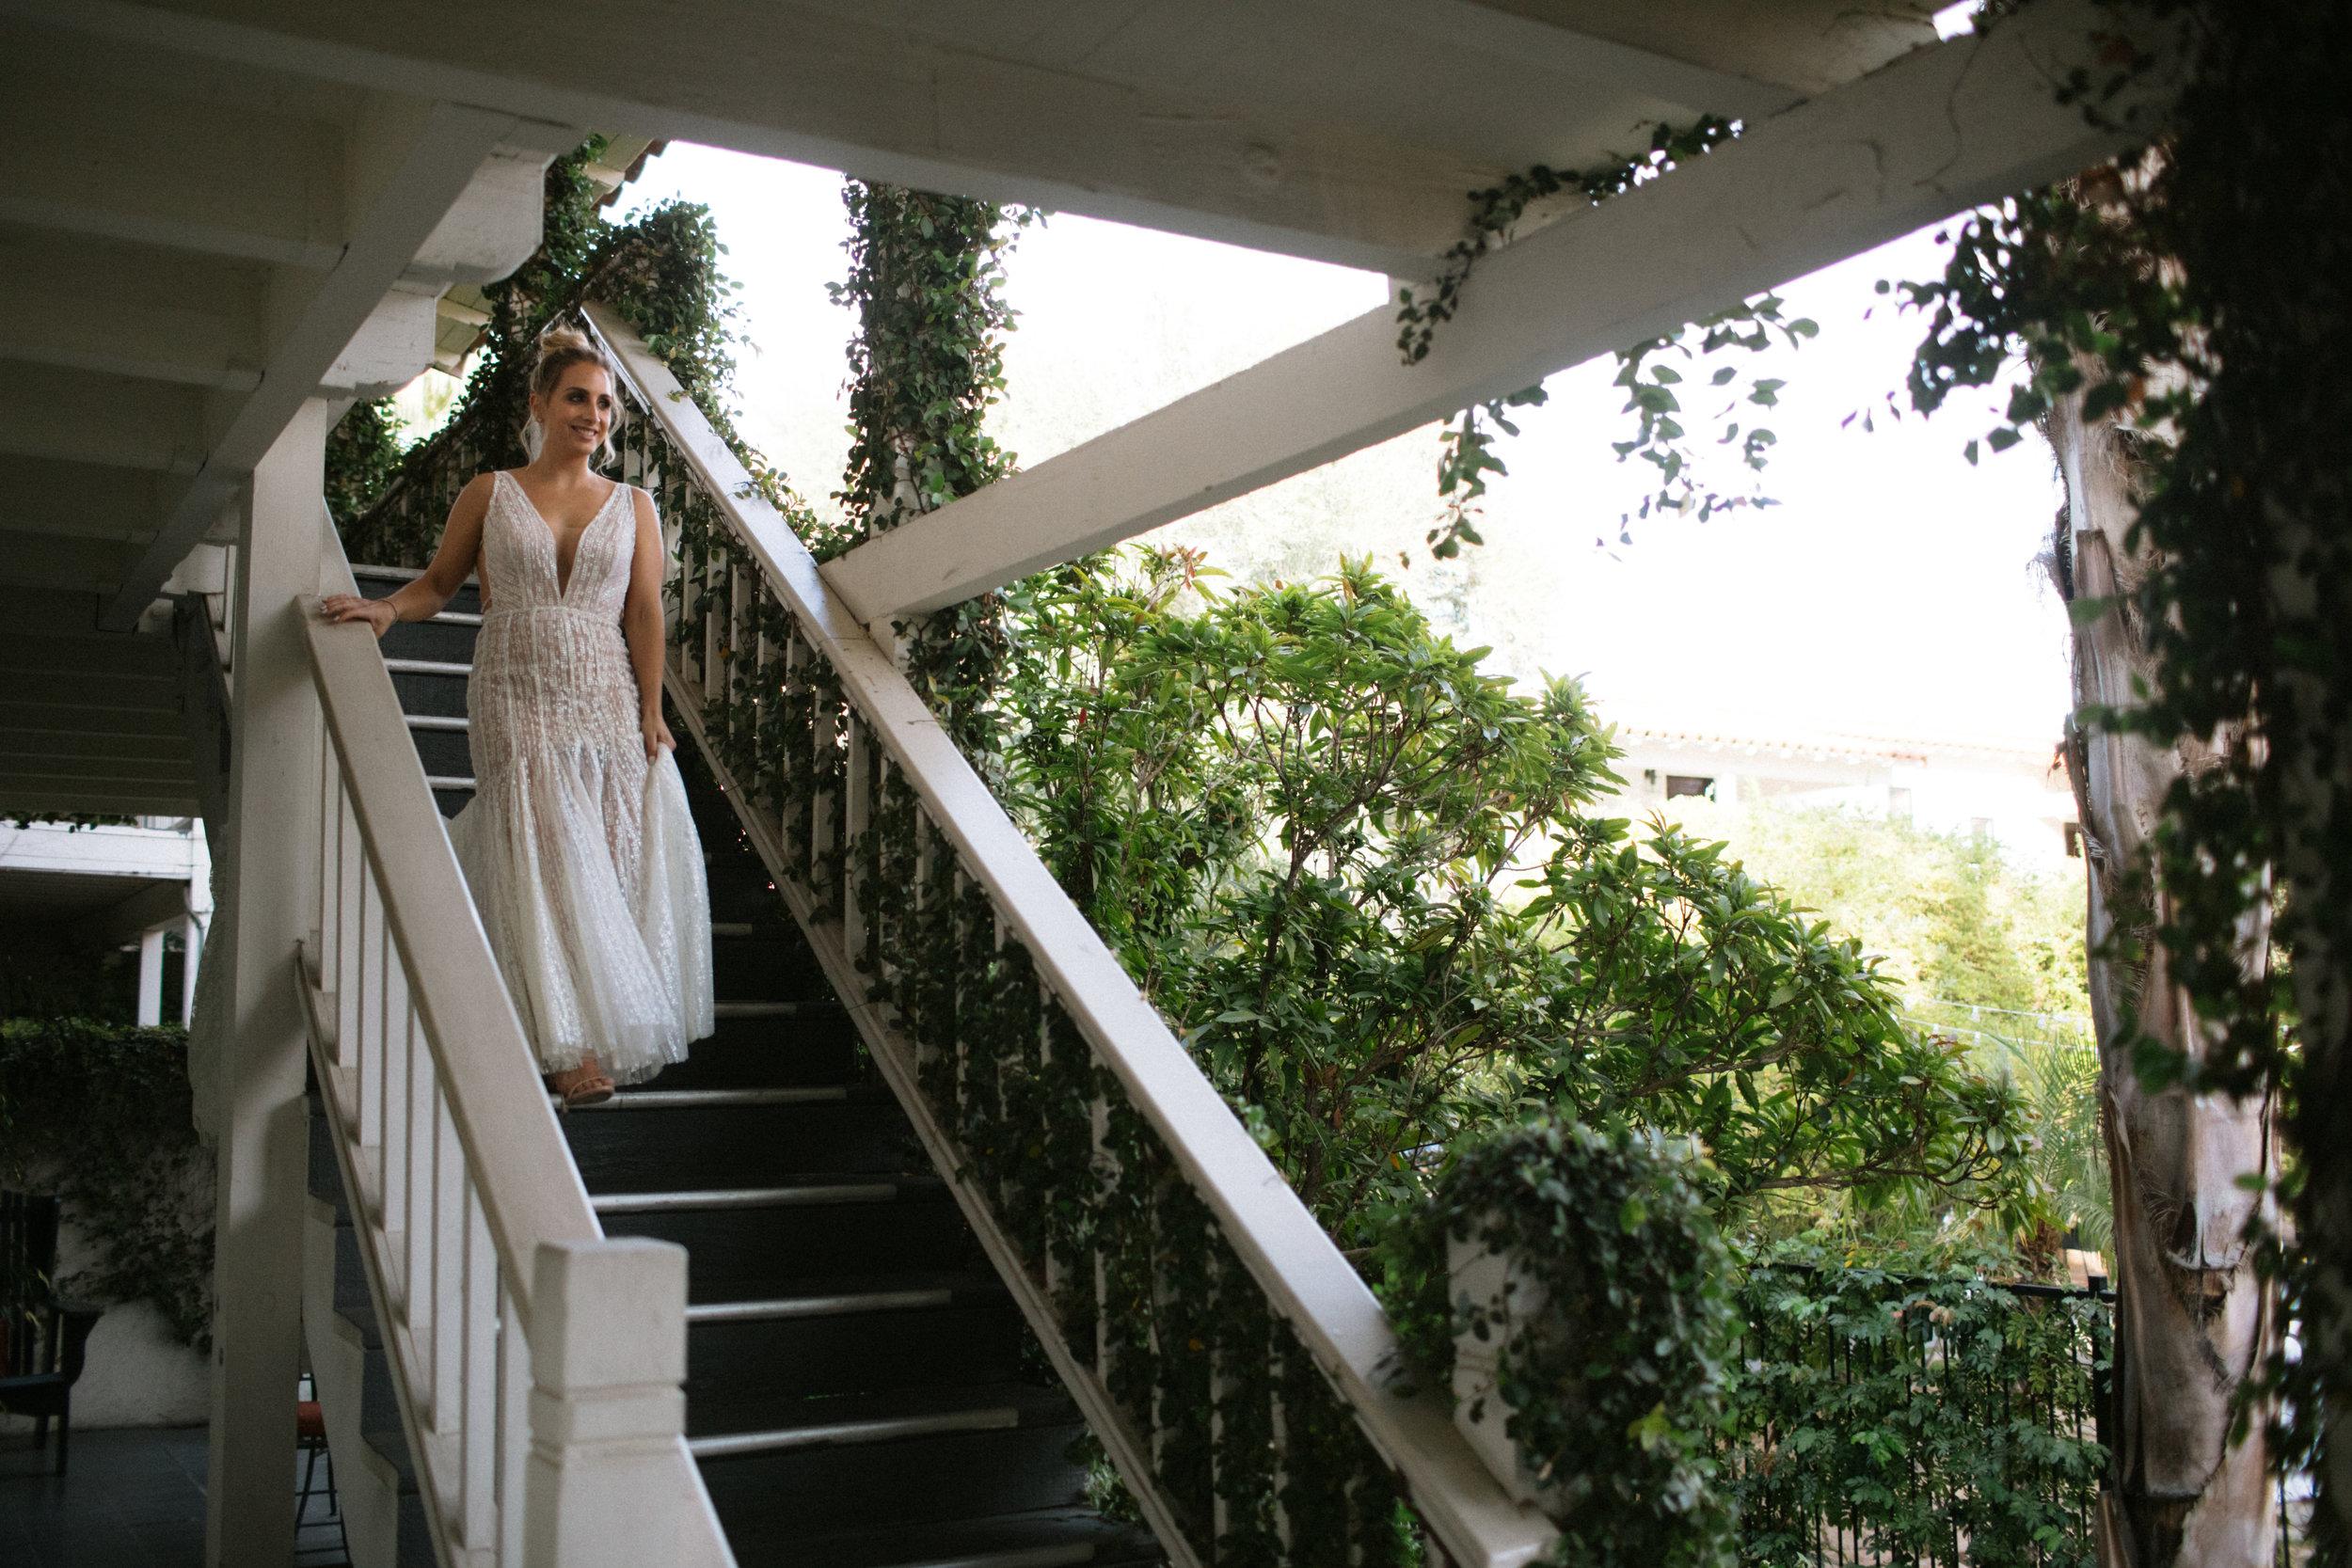 Dara_&_Garrett_Colony_Palms_Hotel_Wedding_Photos-126.jpg